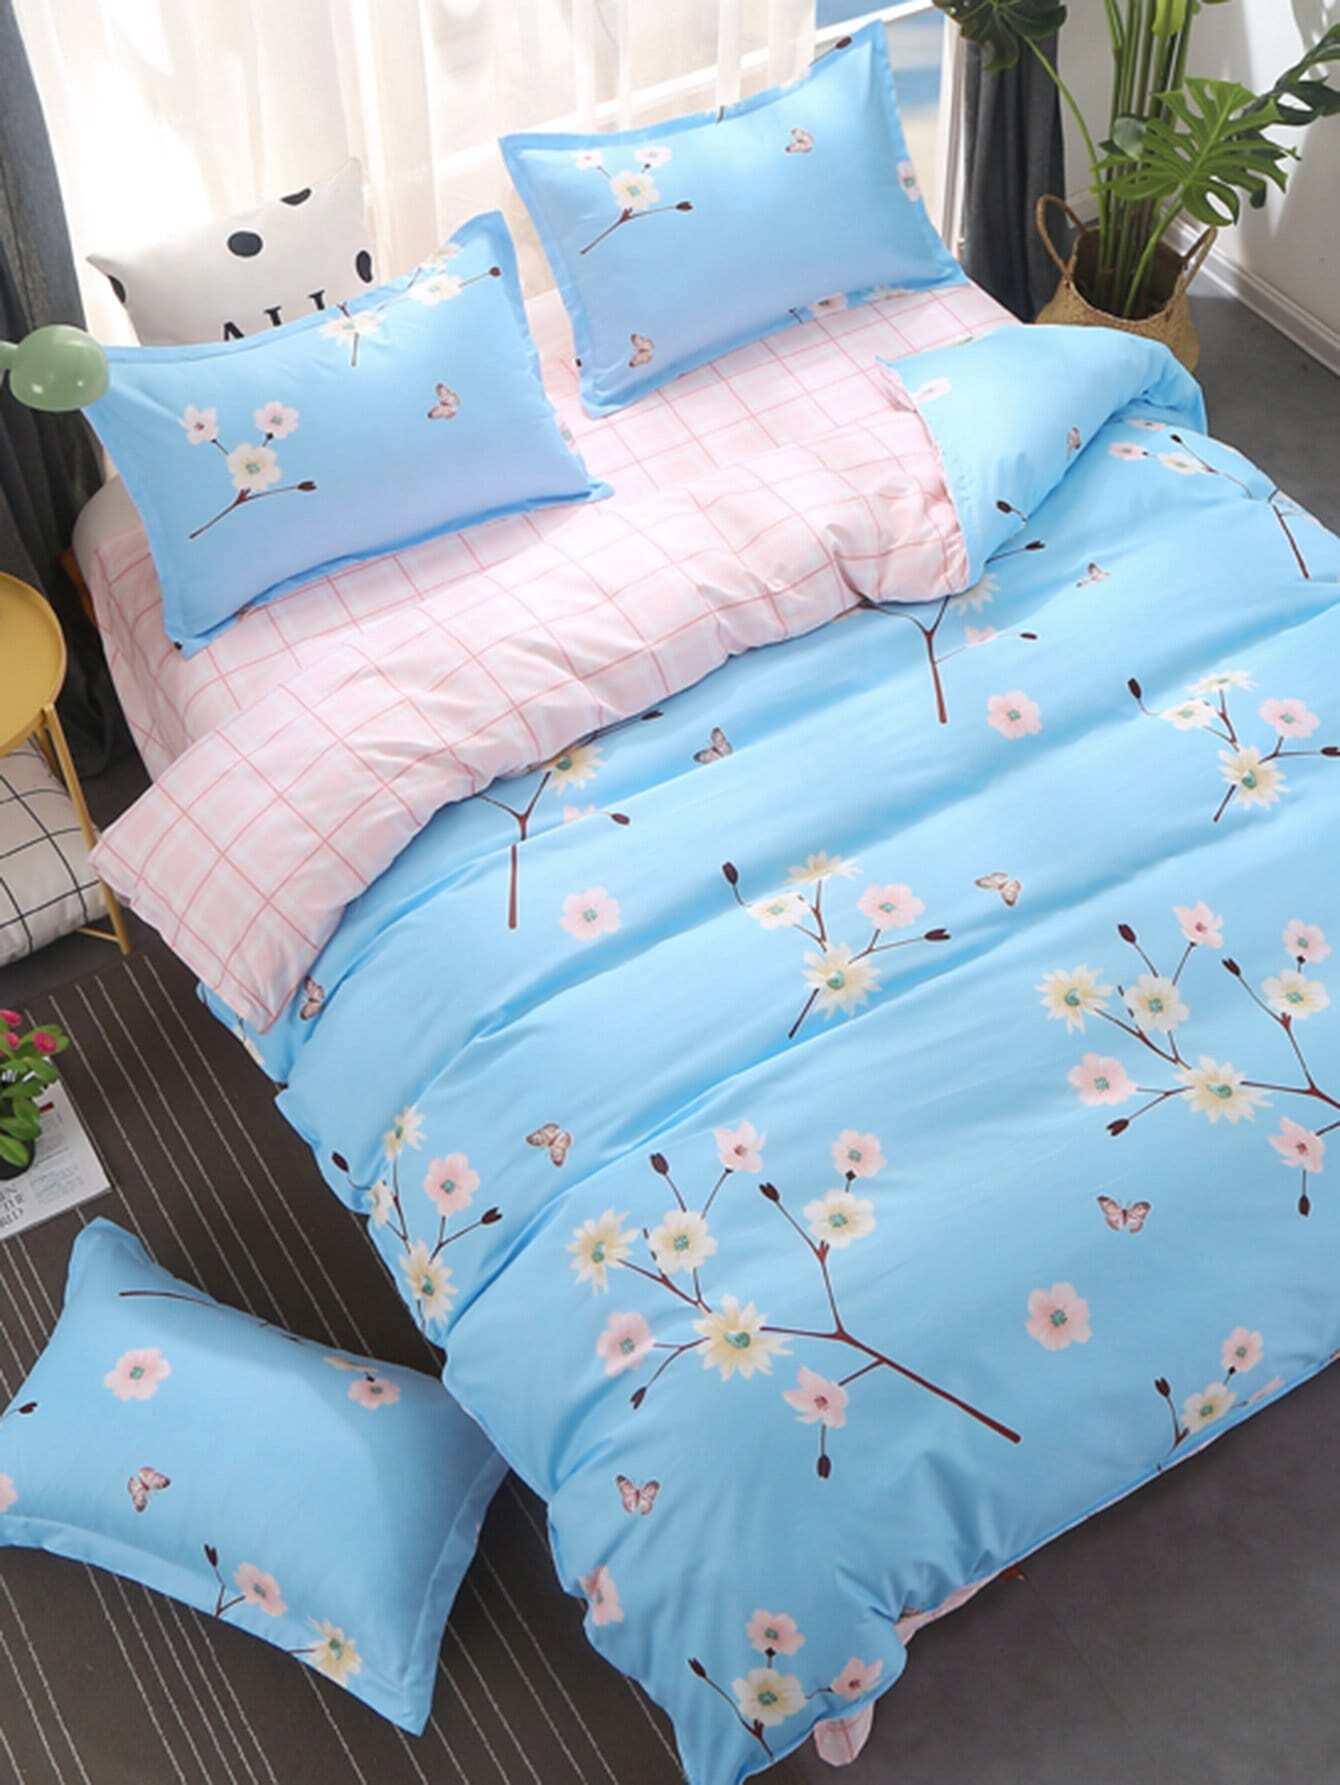 Flower & Plaid Print Bedding Set flower print bedding set